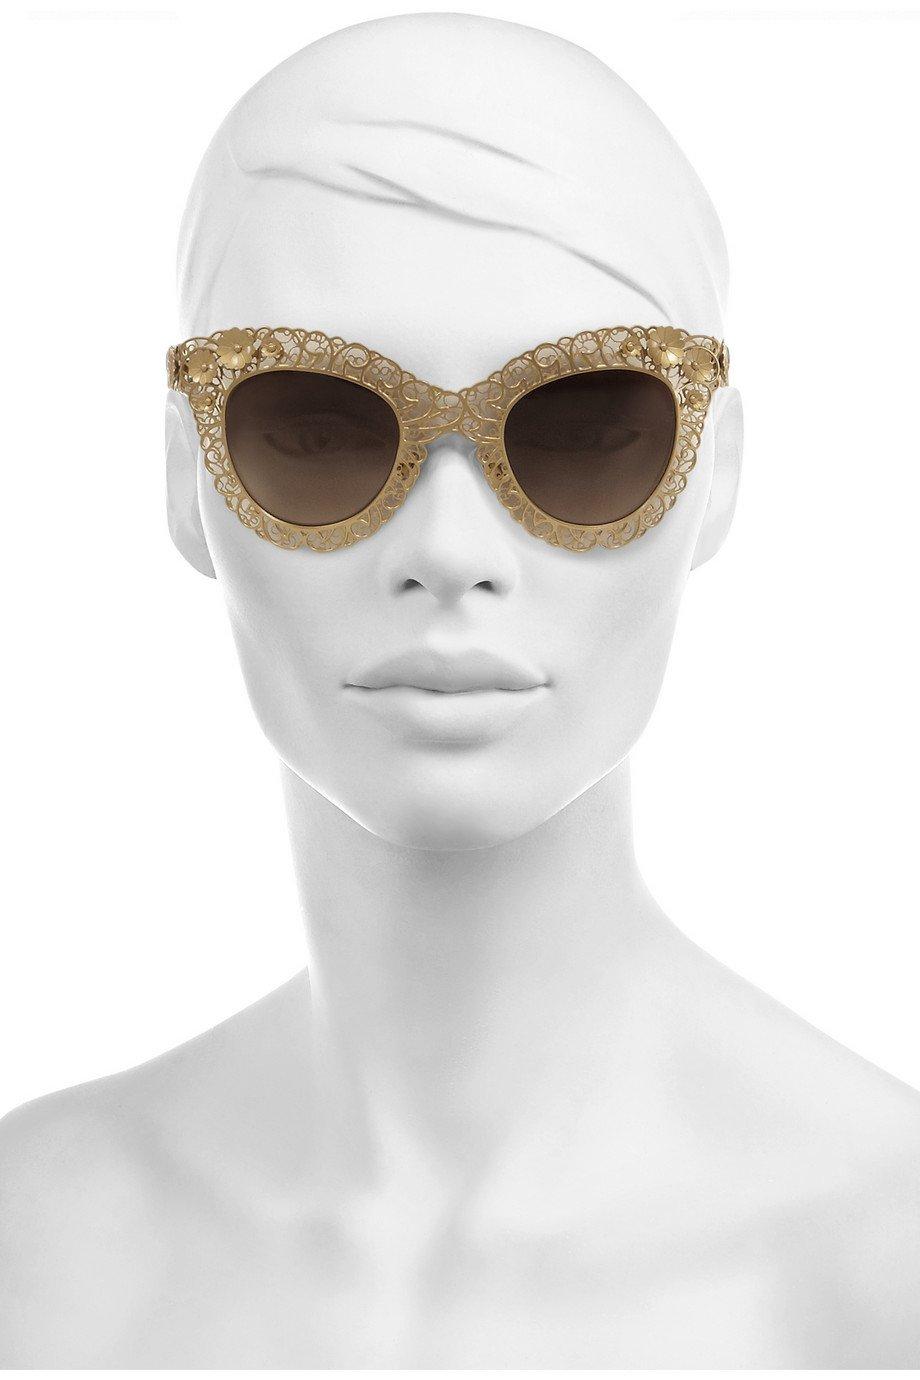 a42c3ad50525 Dolce   gabbana Cat Eye Filigree Goldtone Sunglasses in Metallic